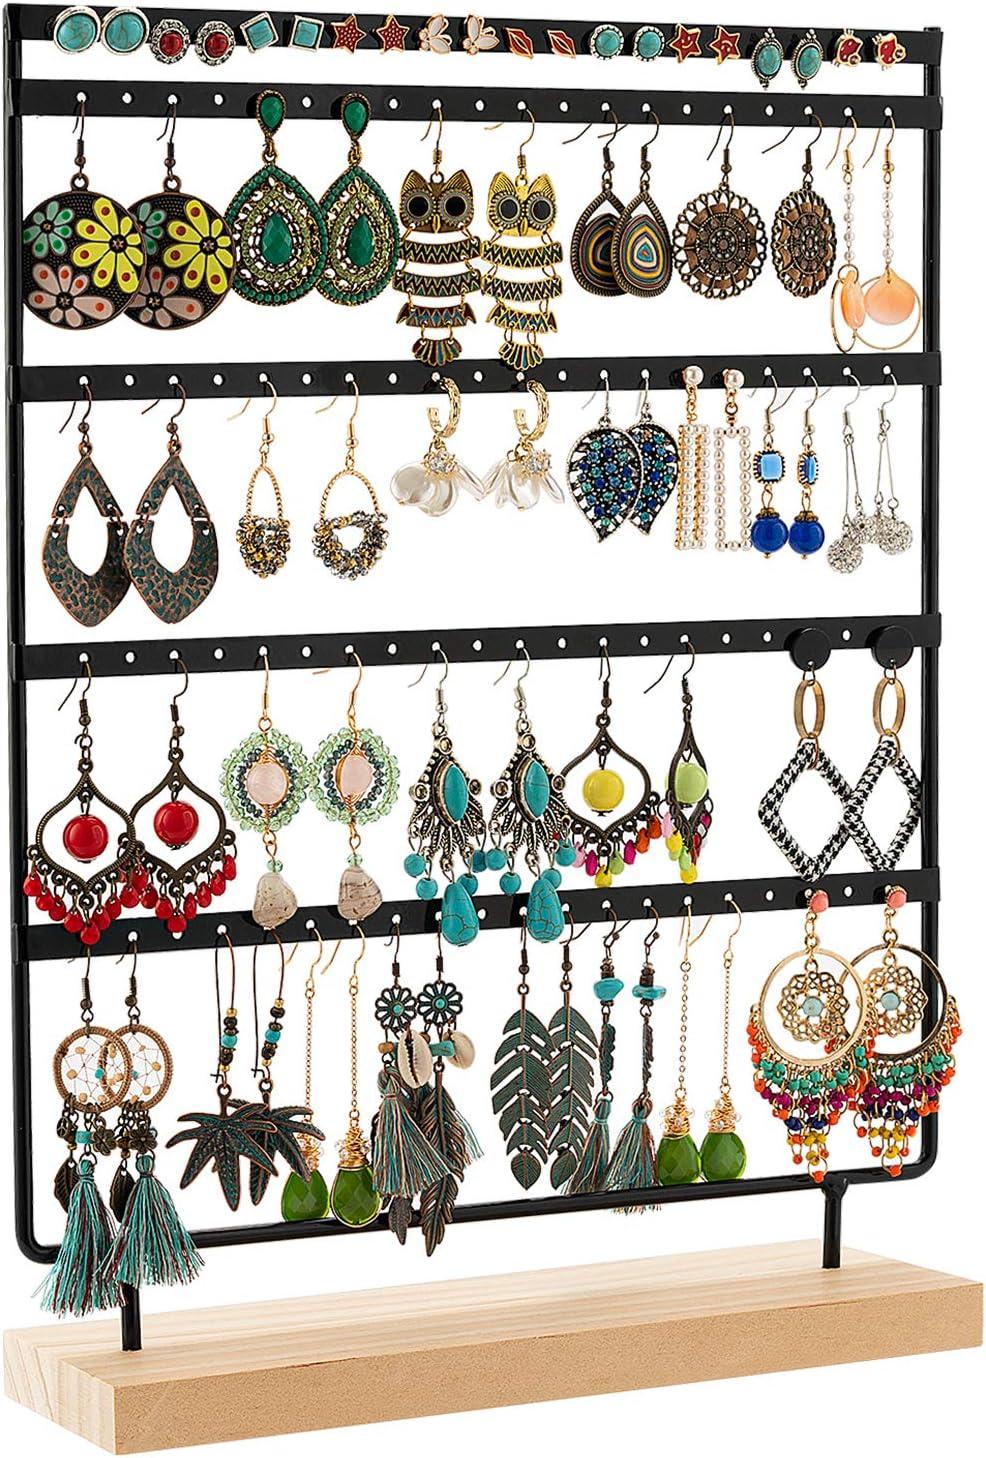 DHMK Earring Holder Stand Jewelry Organizer Display Rack